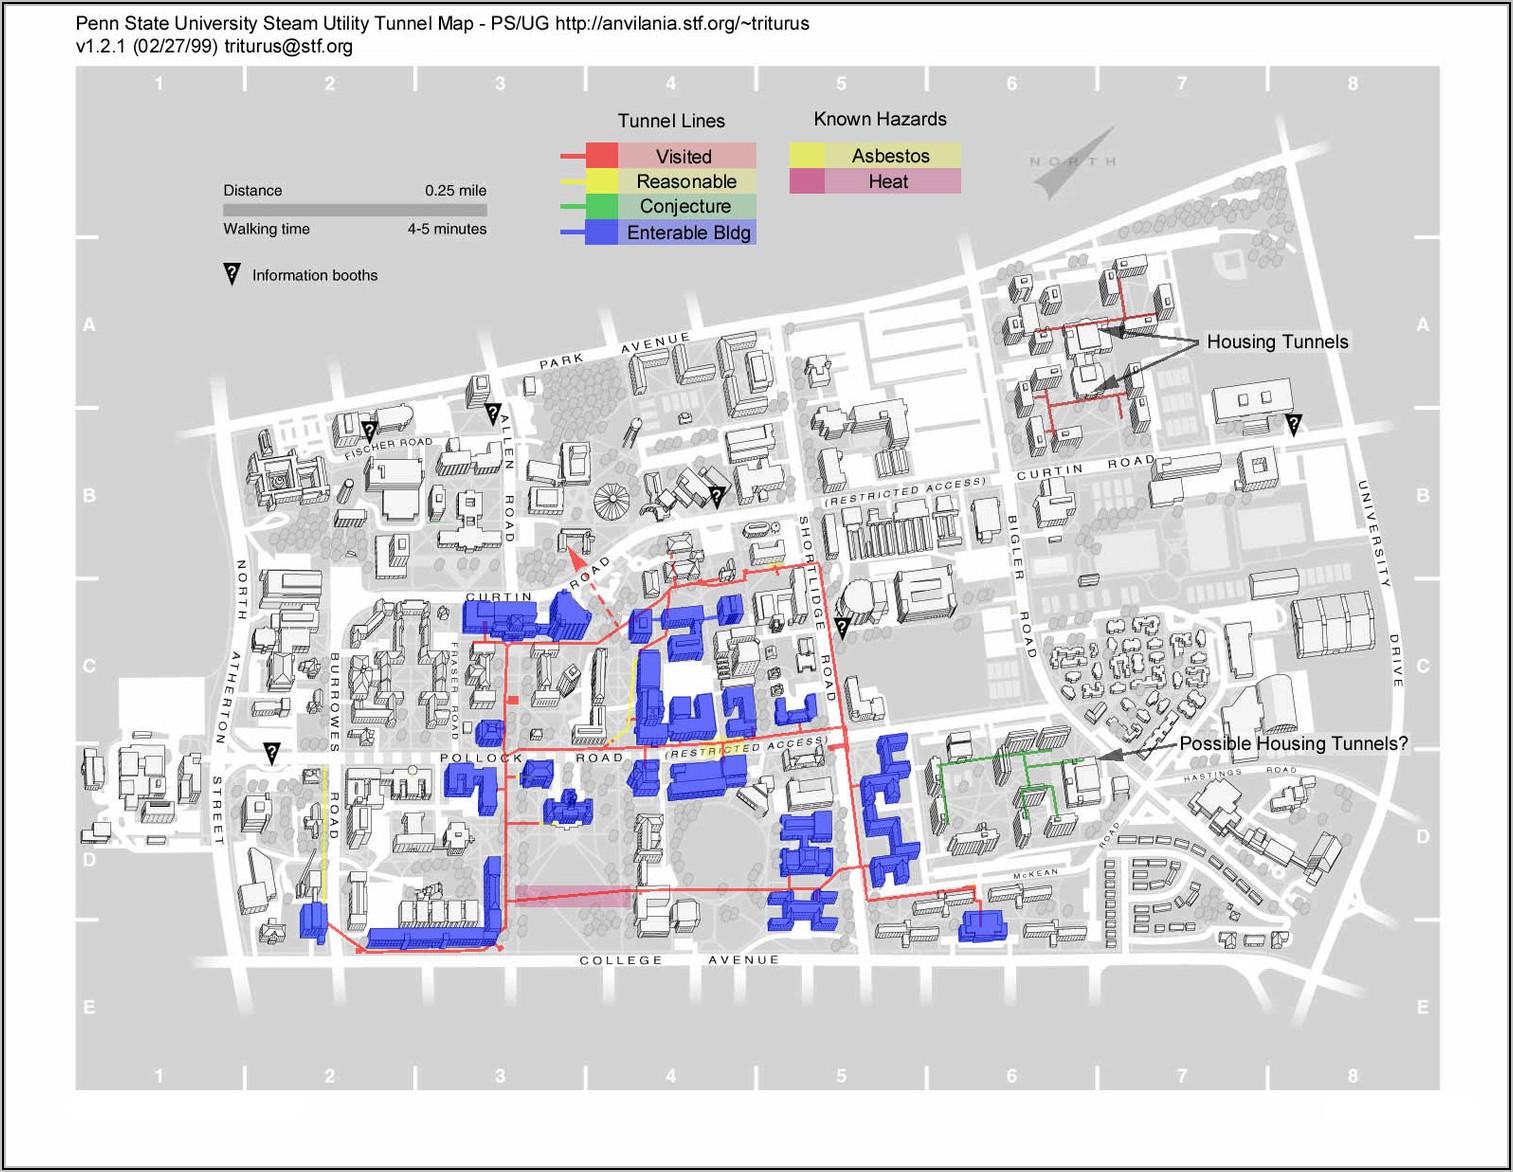 Penn State Main Campus Dorm Map